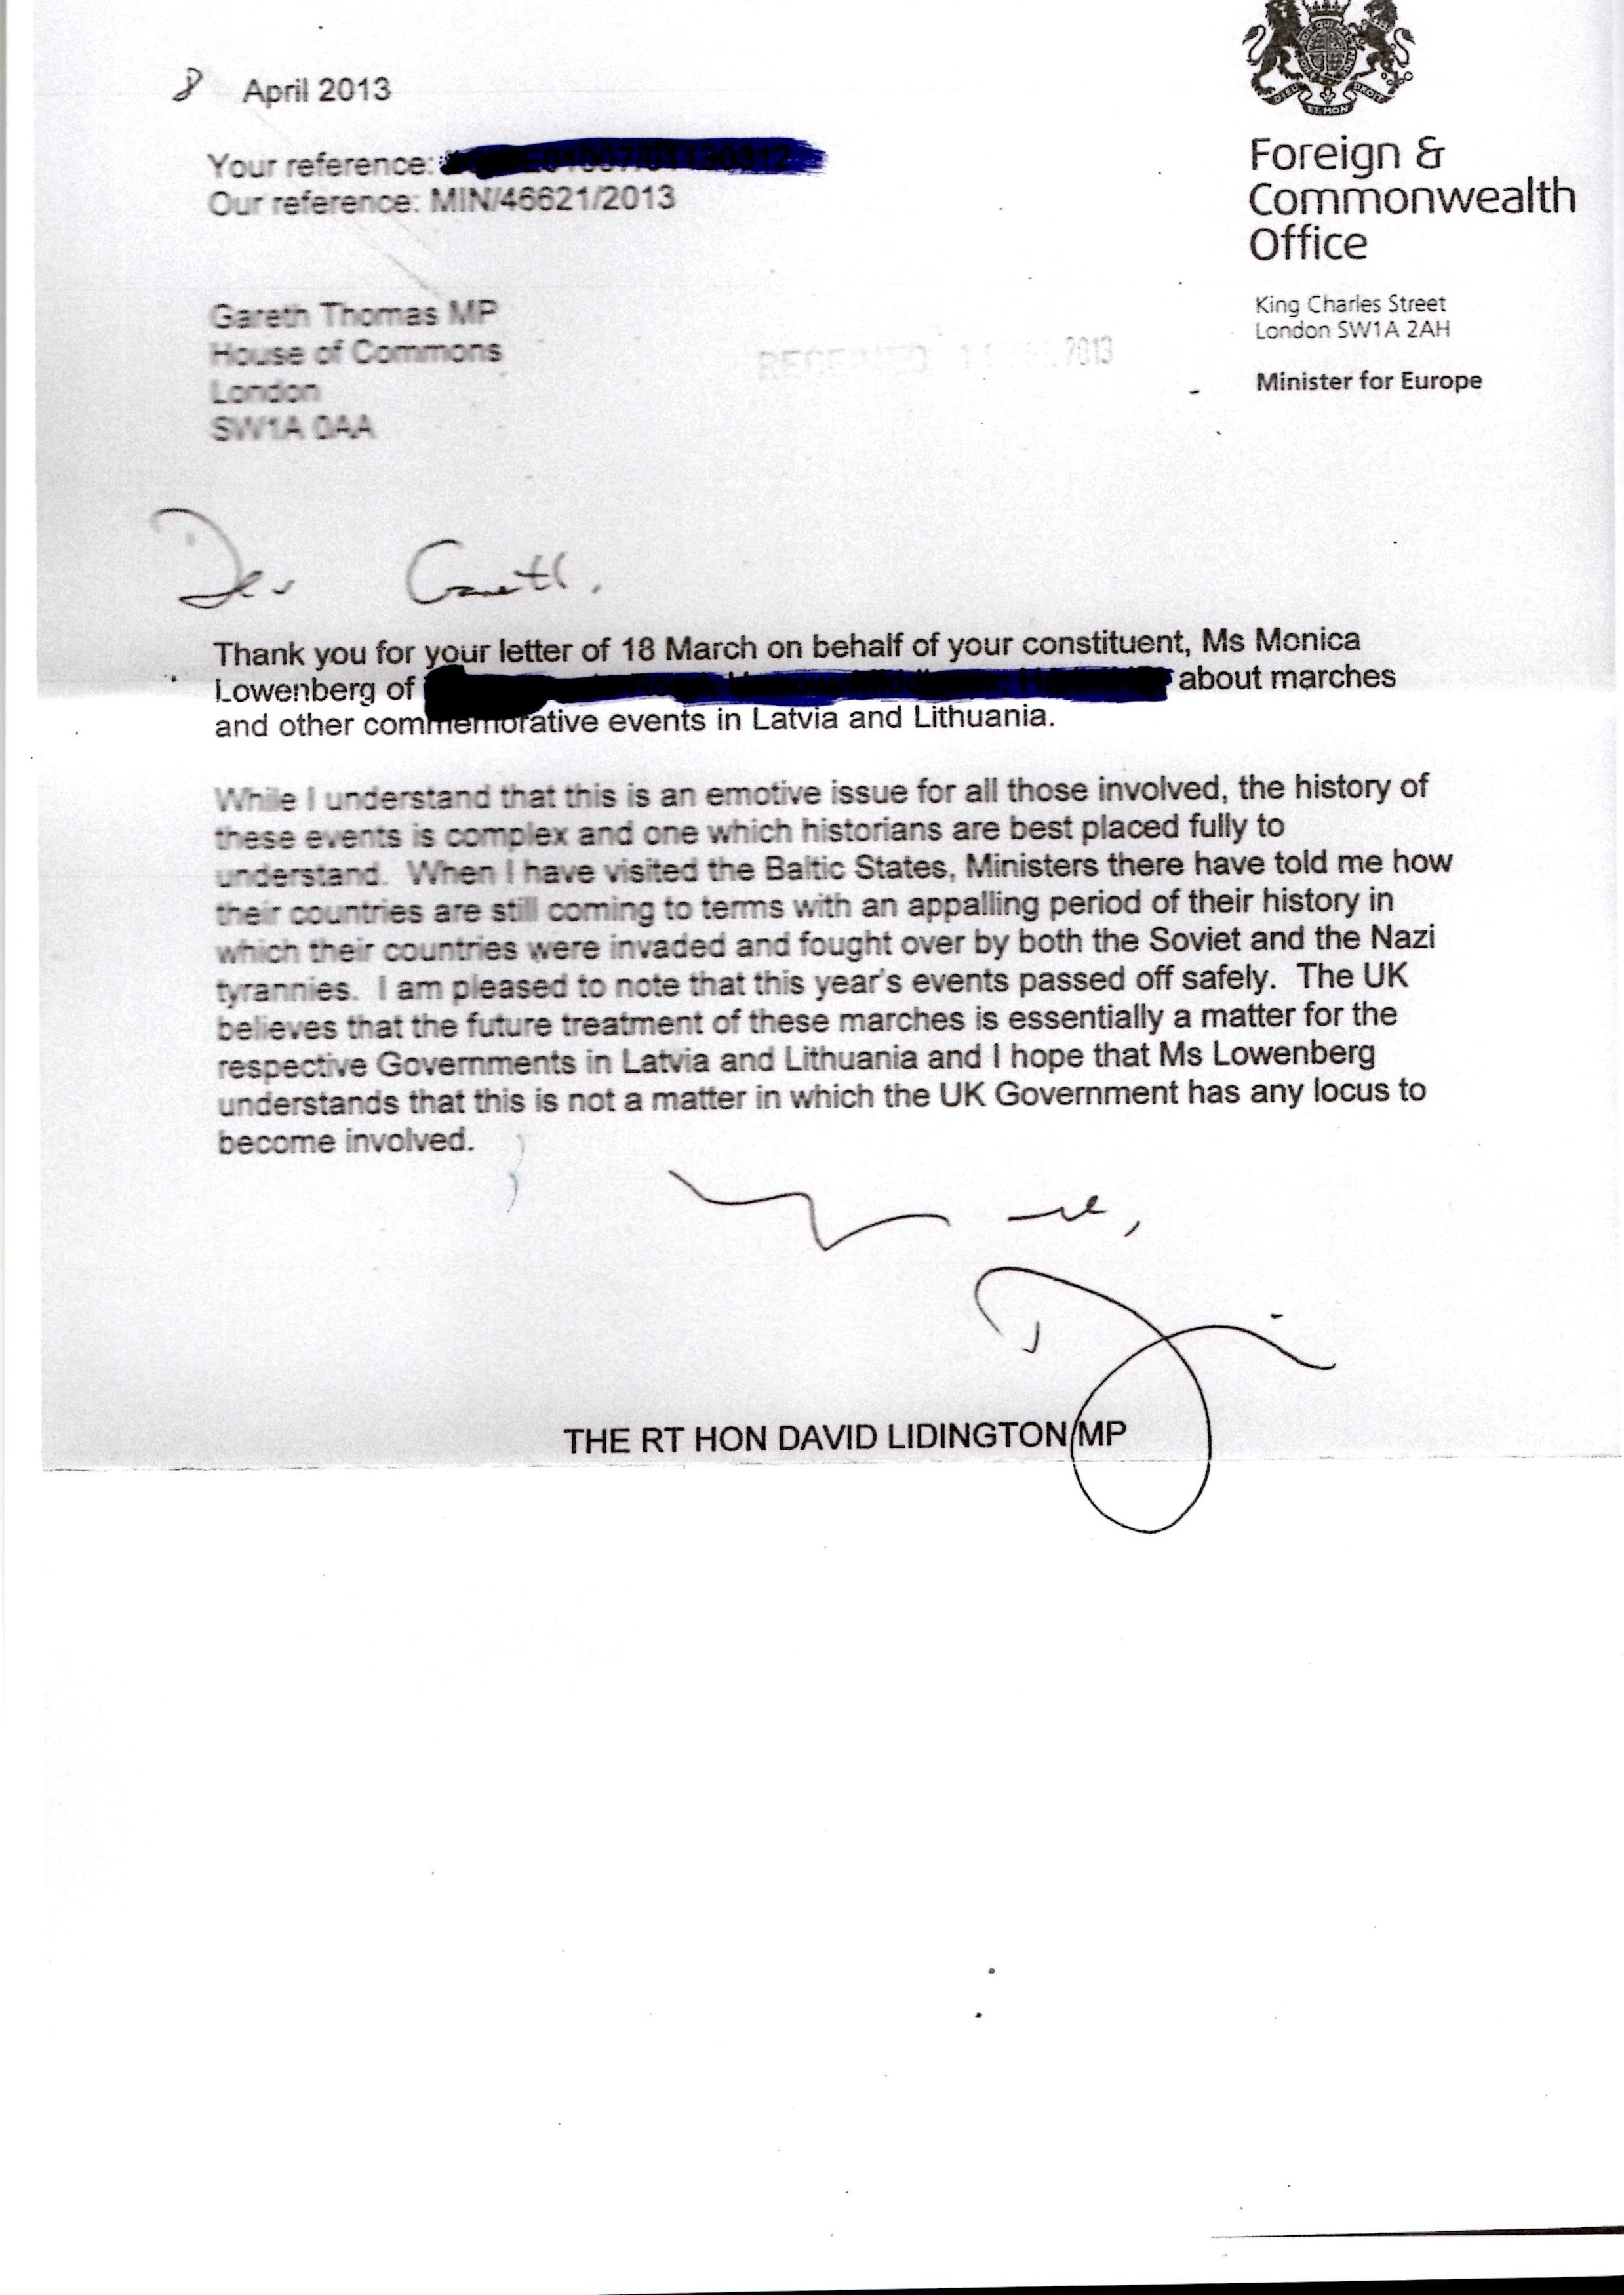 Lidington to Thomas 8 April 2013 letter